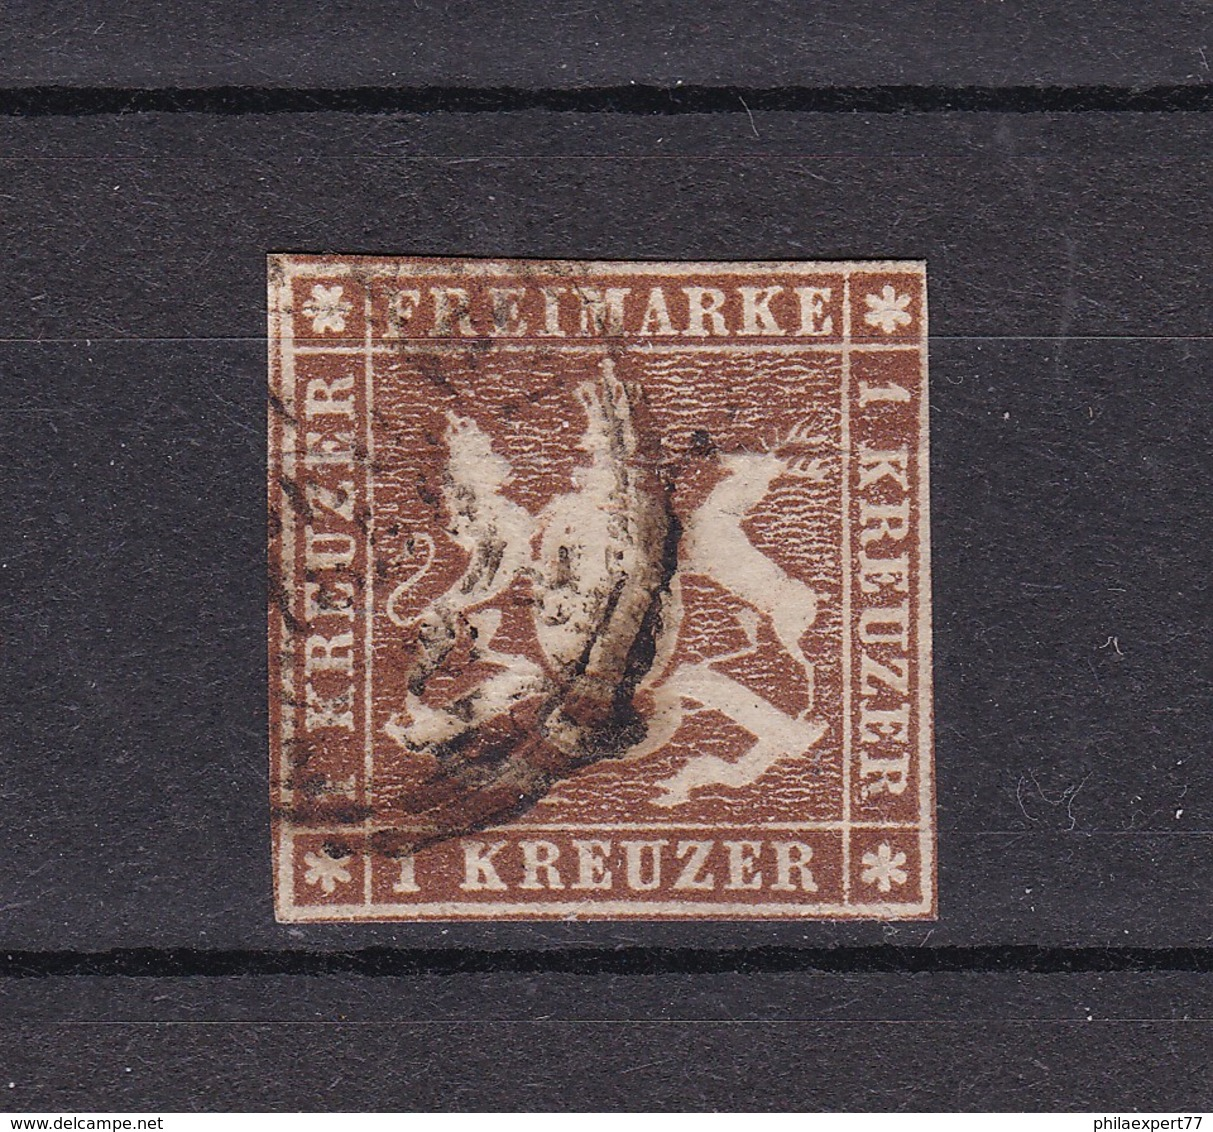 Wuerttemberg - 1857 - Michel Nr. 6 - 100 Euro - Wuerttemberg